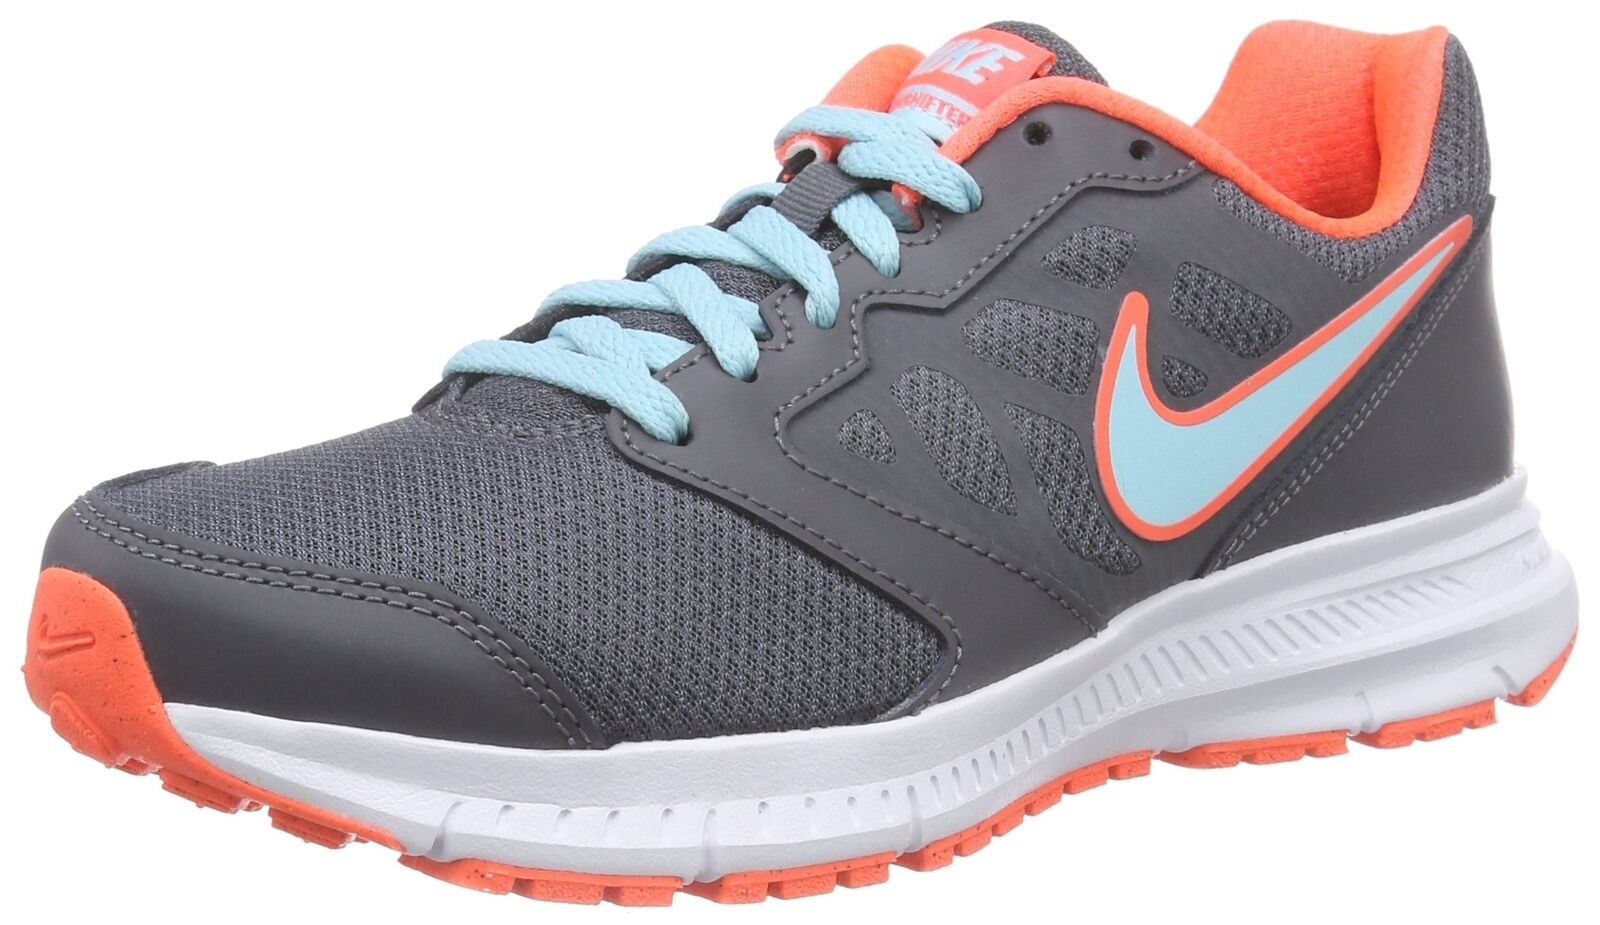 Nike Downshifter 6 Running shoes Dark Grey Copa Hyper orange White 7.5 M US